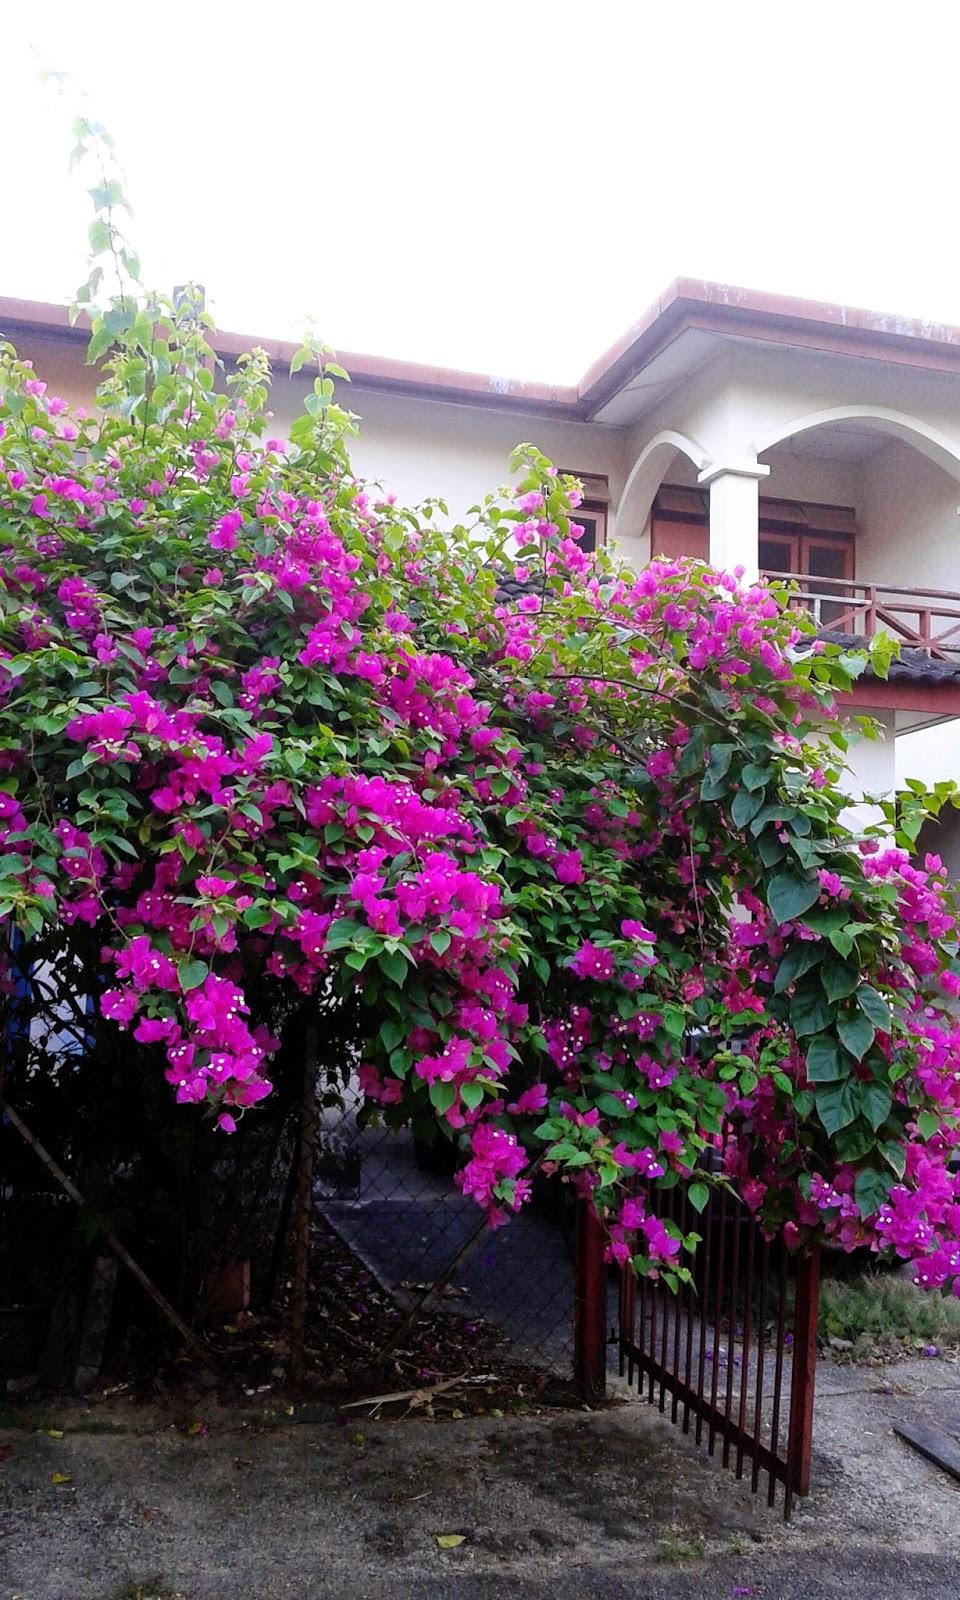 siapa yang patut ditendang, mencipta alasan, bunga kertas unggu, bunga kerta pink, rumah, siapa yang patut ditendang,faktor